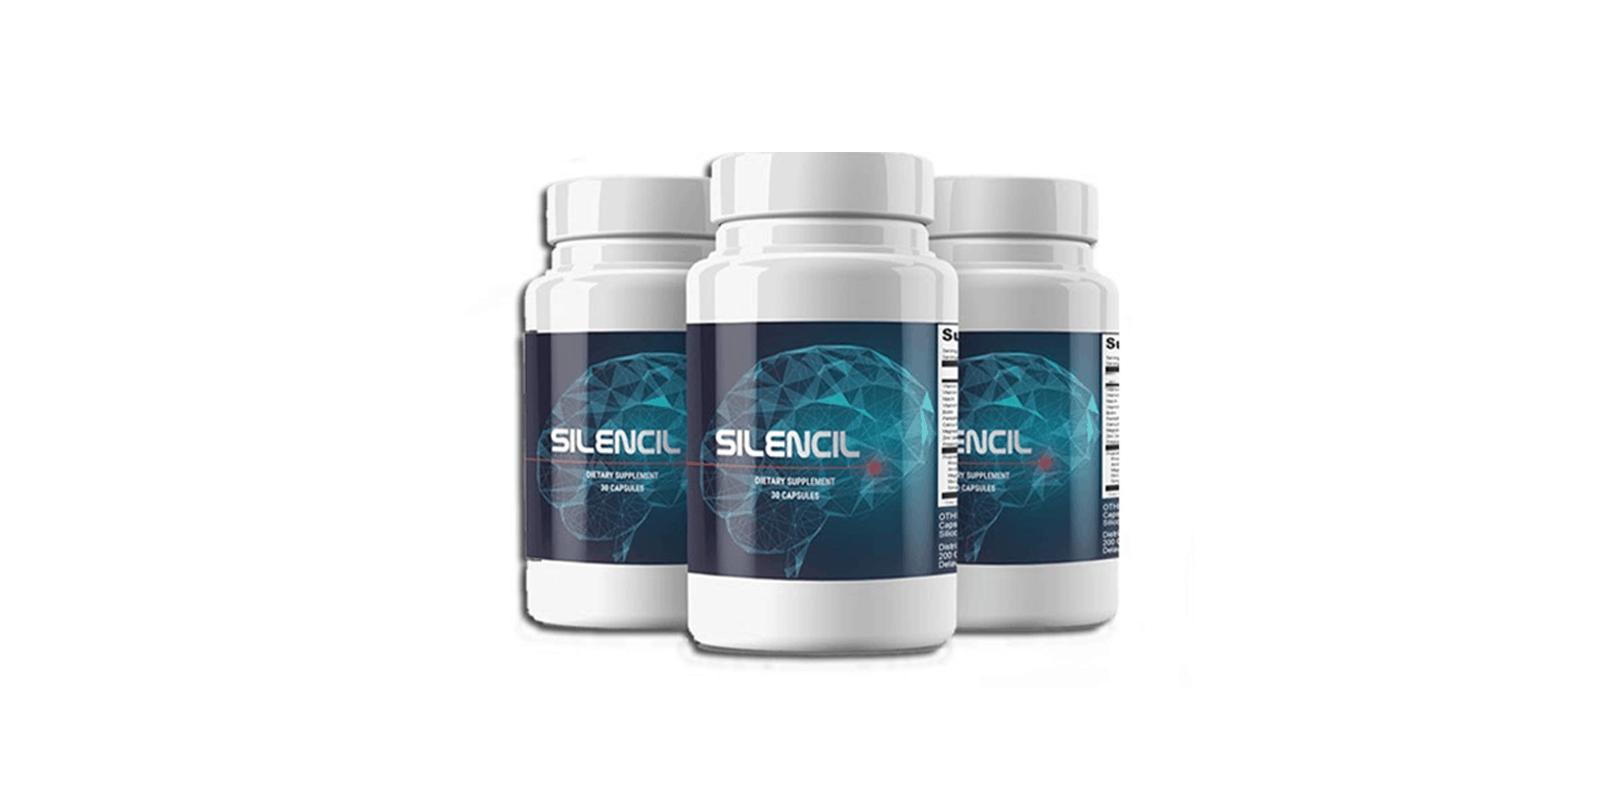 Silencil-Review